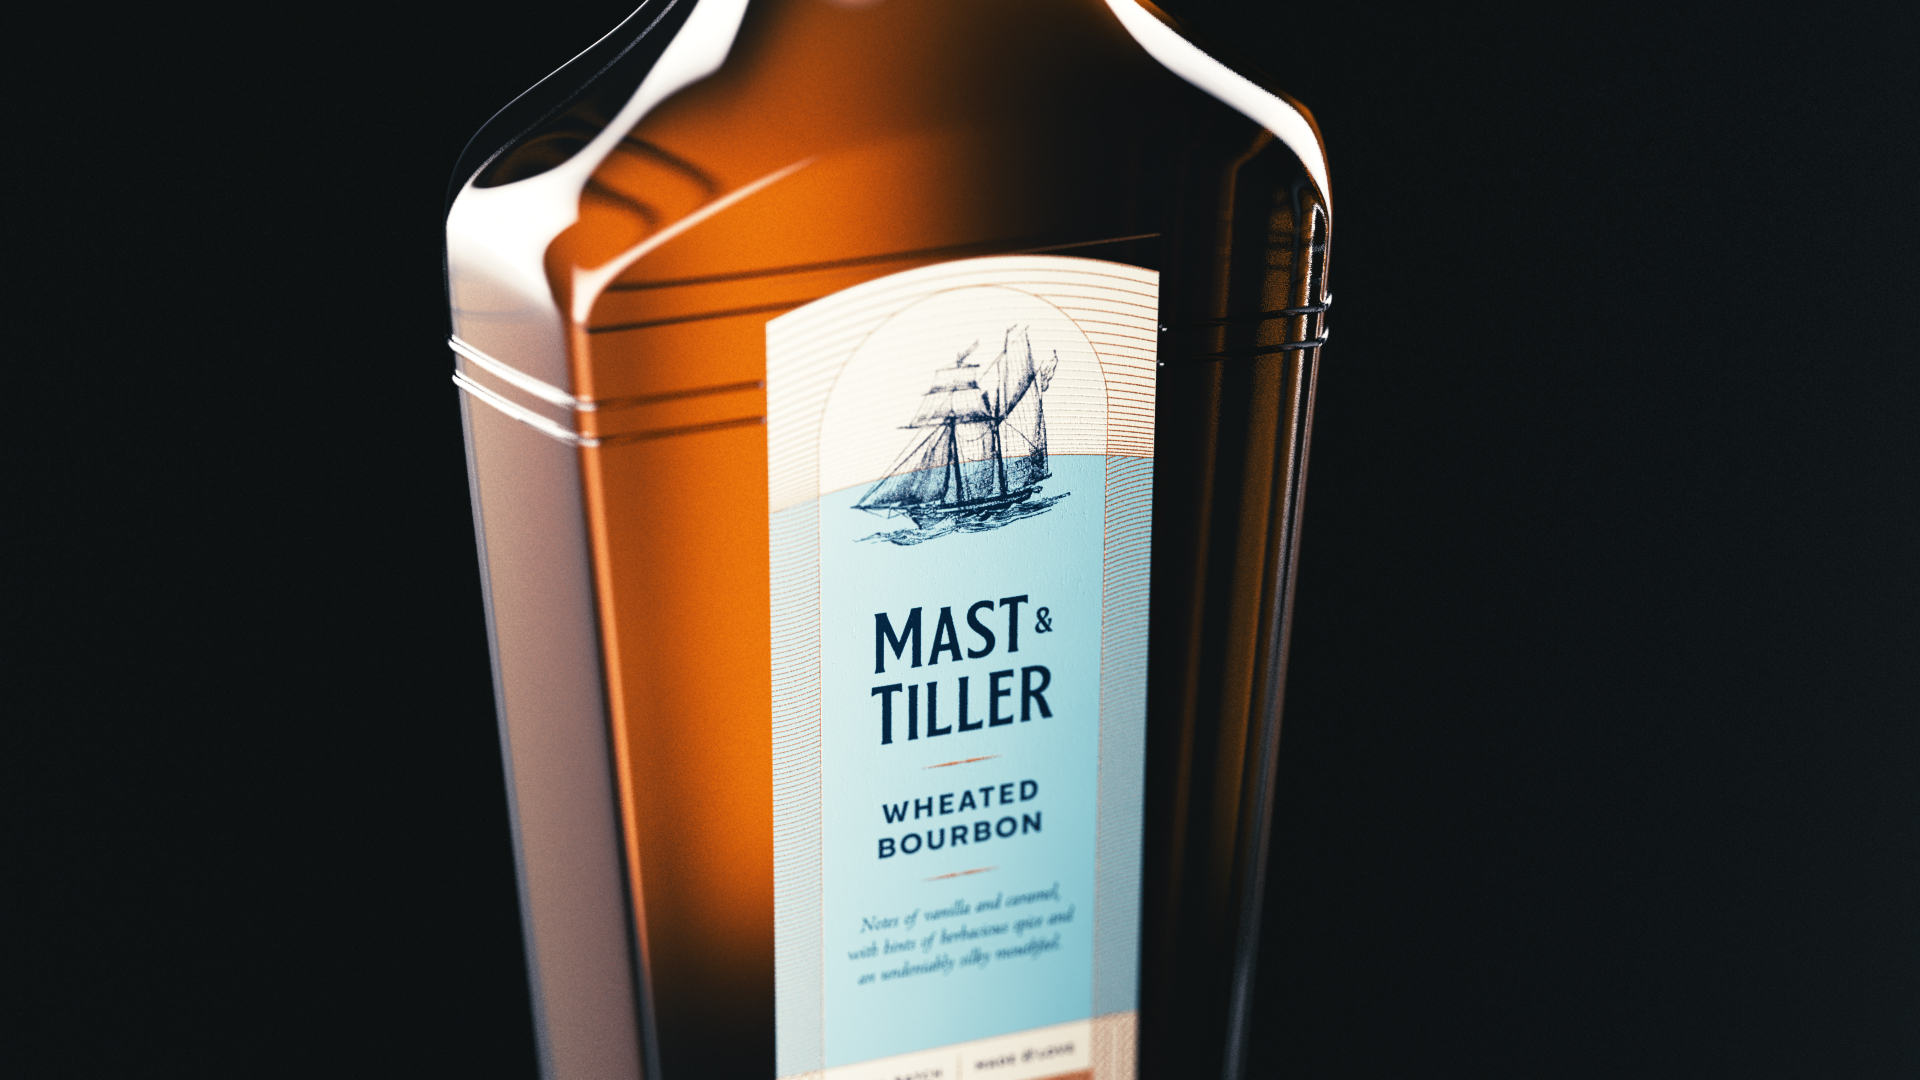 Mast & Tiller